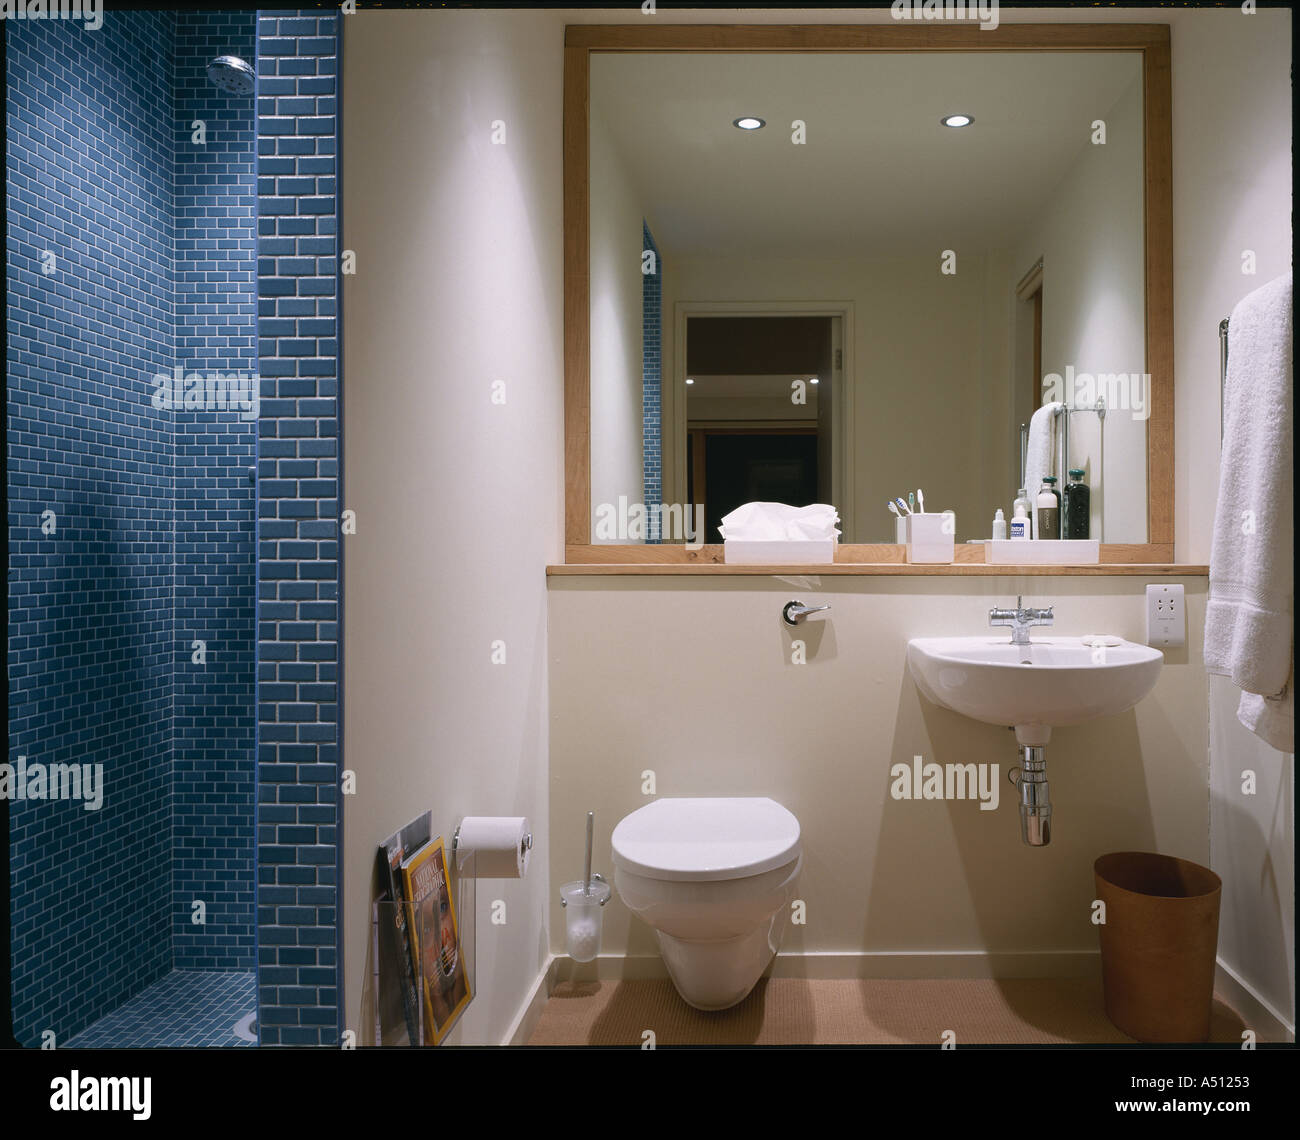 The Lodge Whithurst Park Interior Modern Bathroom Architect James Gorst Architects